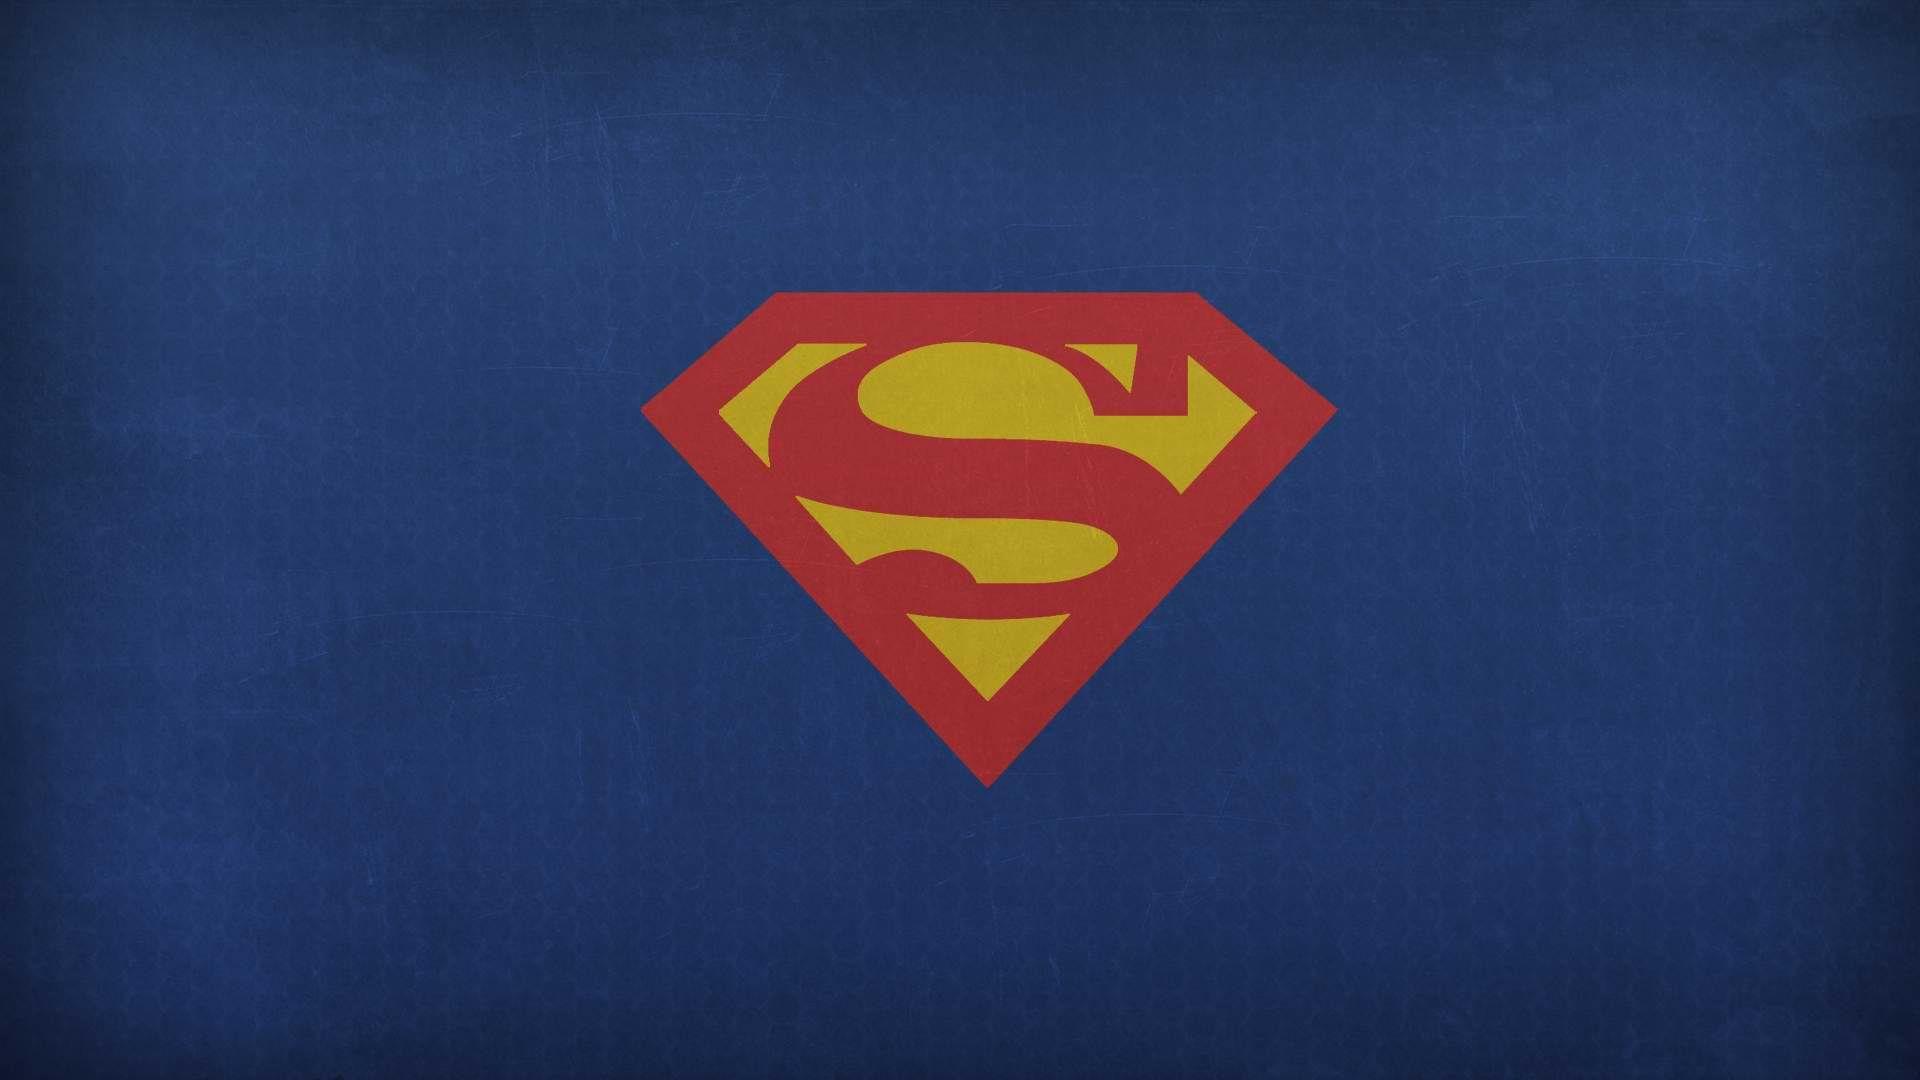 Superman logo photo wallpaperg 19201080 superman logo superman wallpaper buycottarizona Gallery